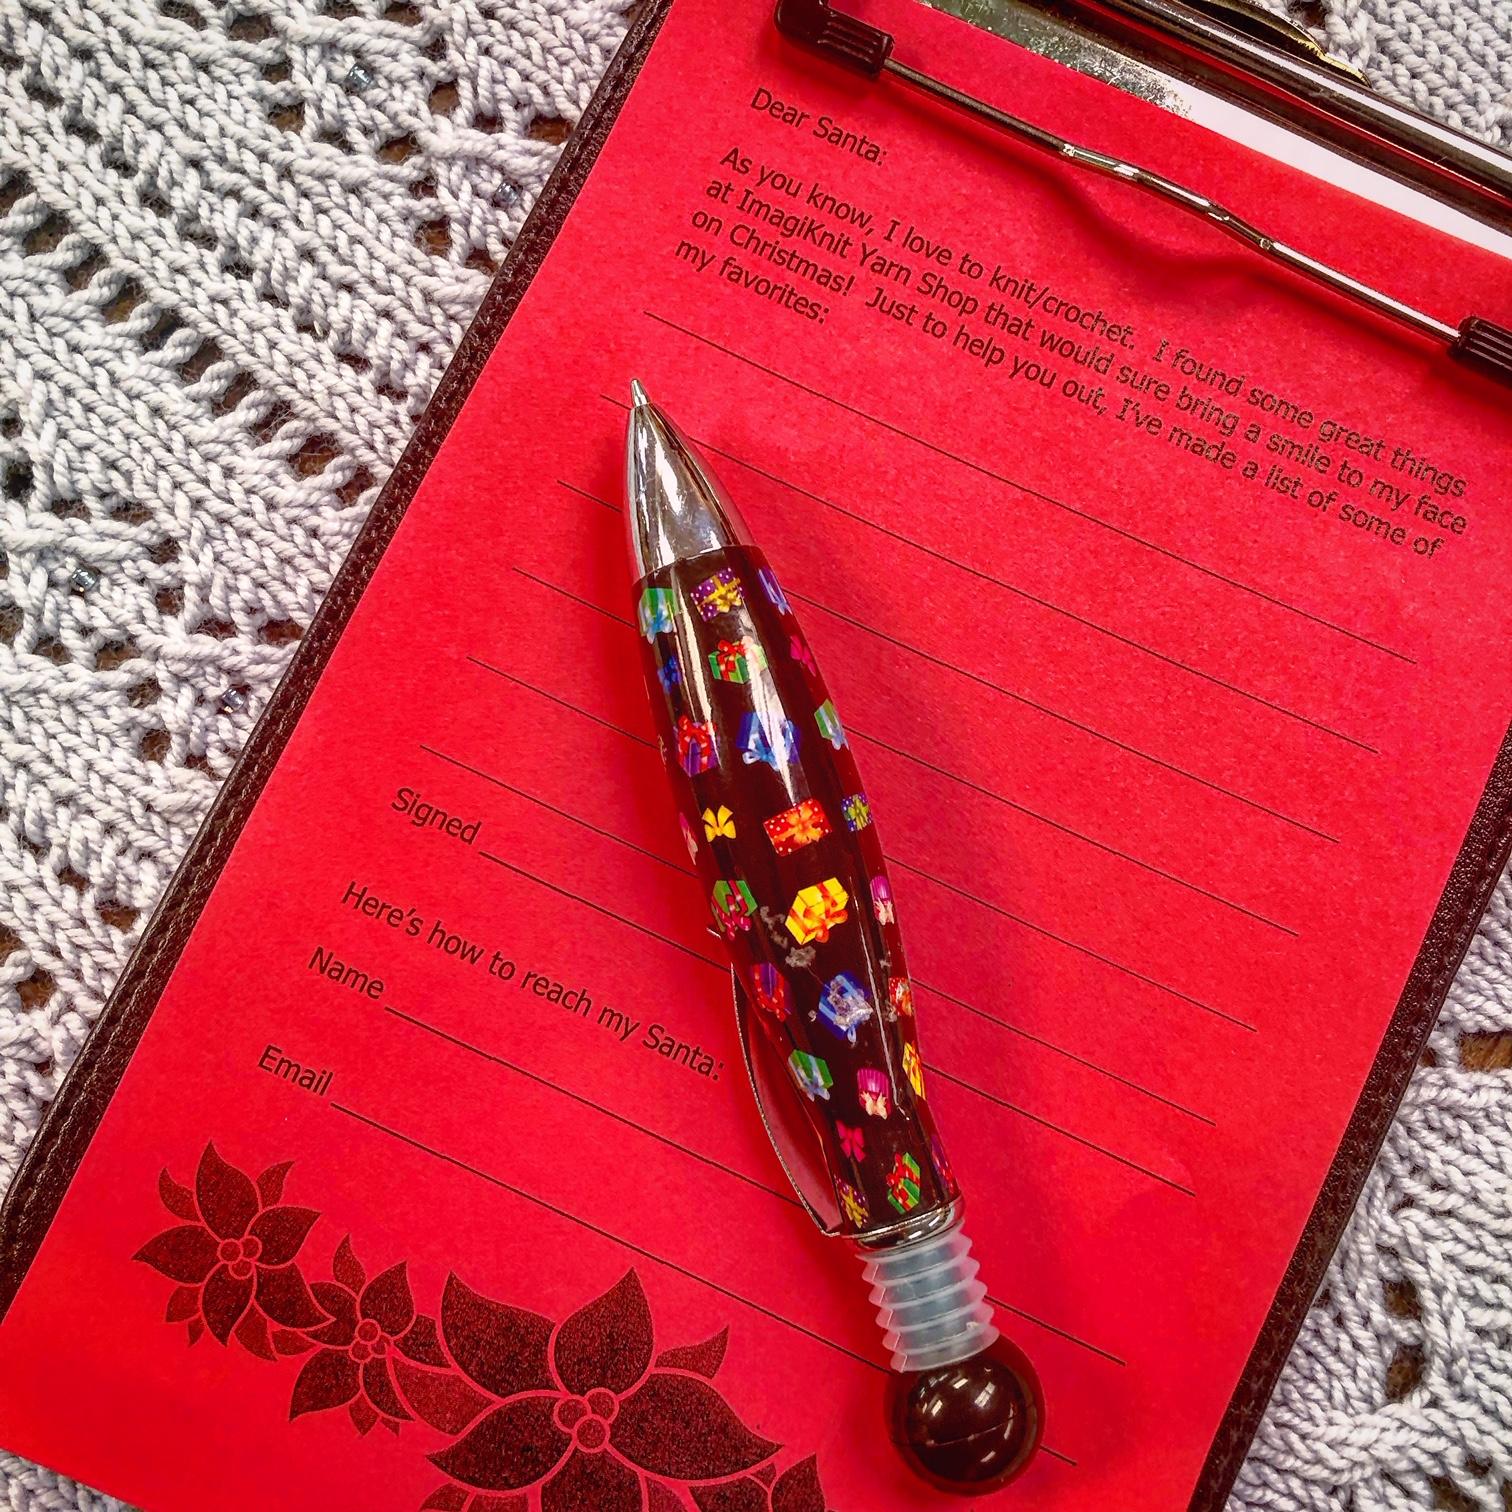 ImagiKnit Yarn Shop Omaha Wish List